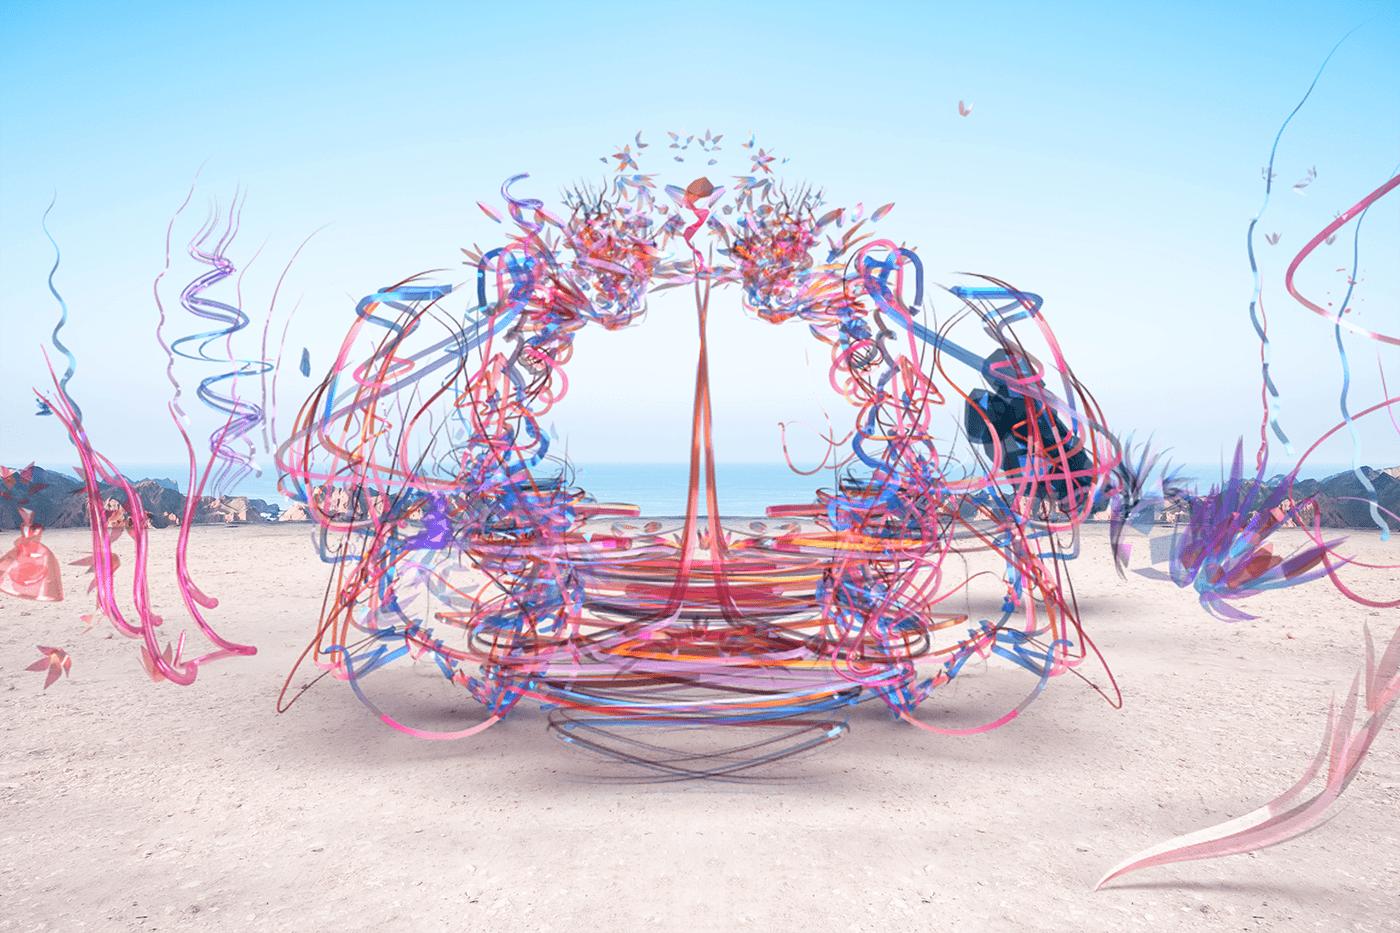 Art Installation Digital Art  dreams exploration imagination perception reality surrealism